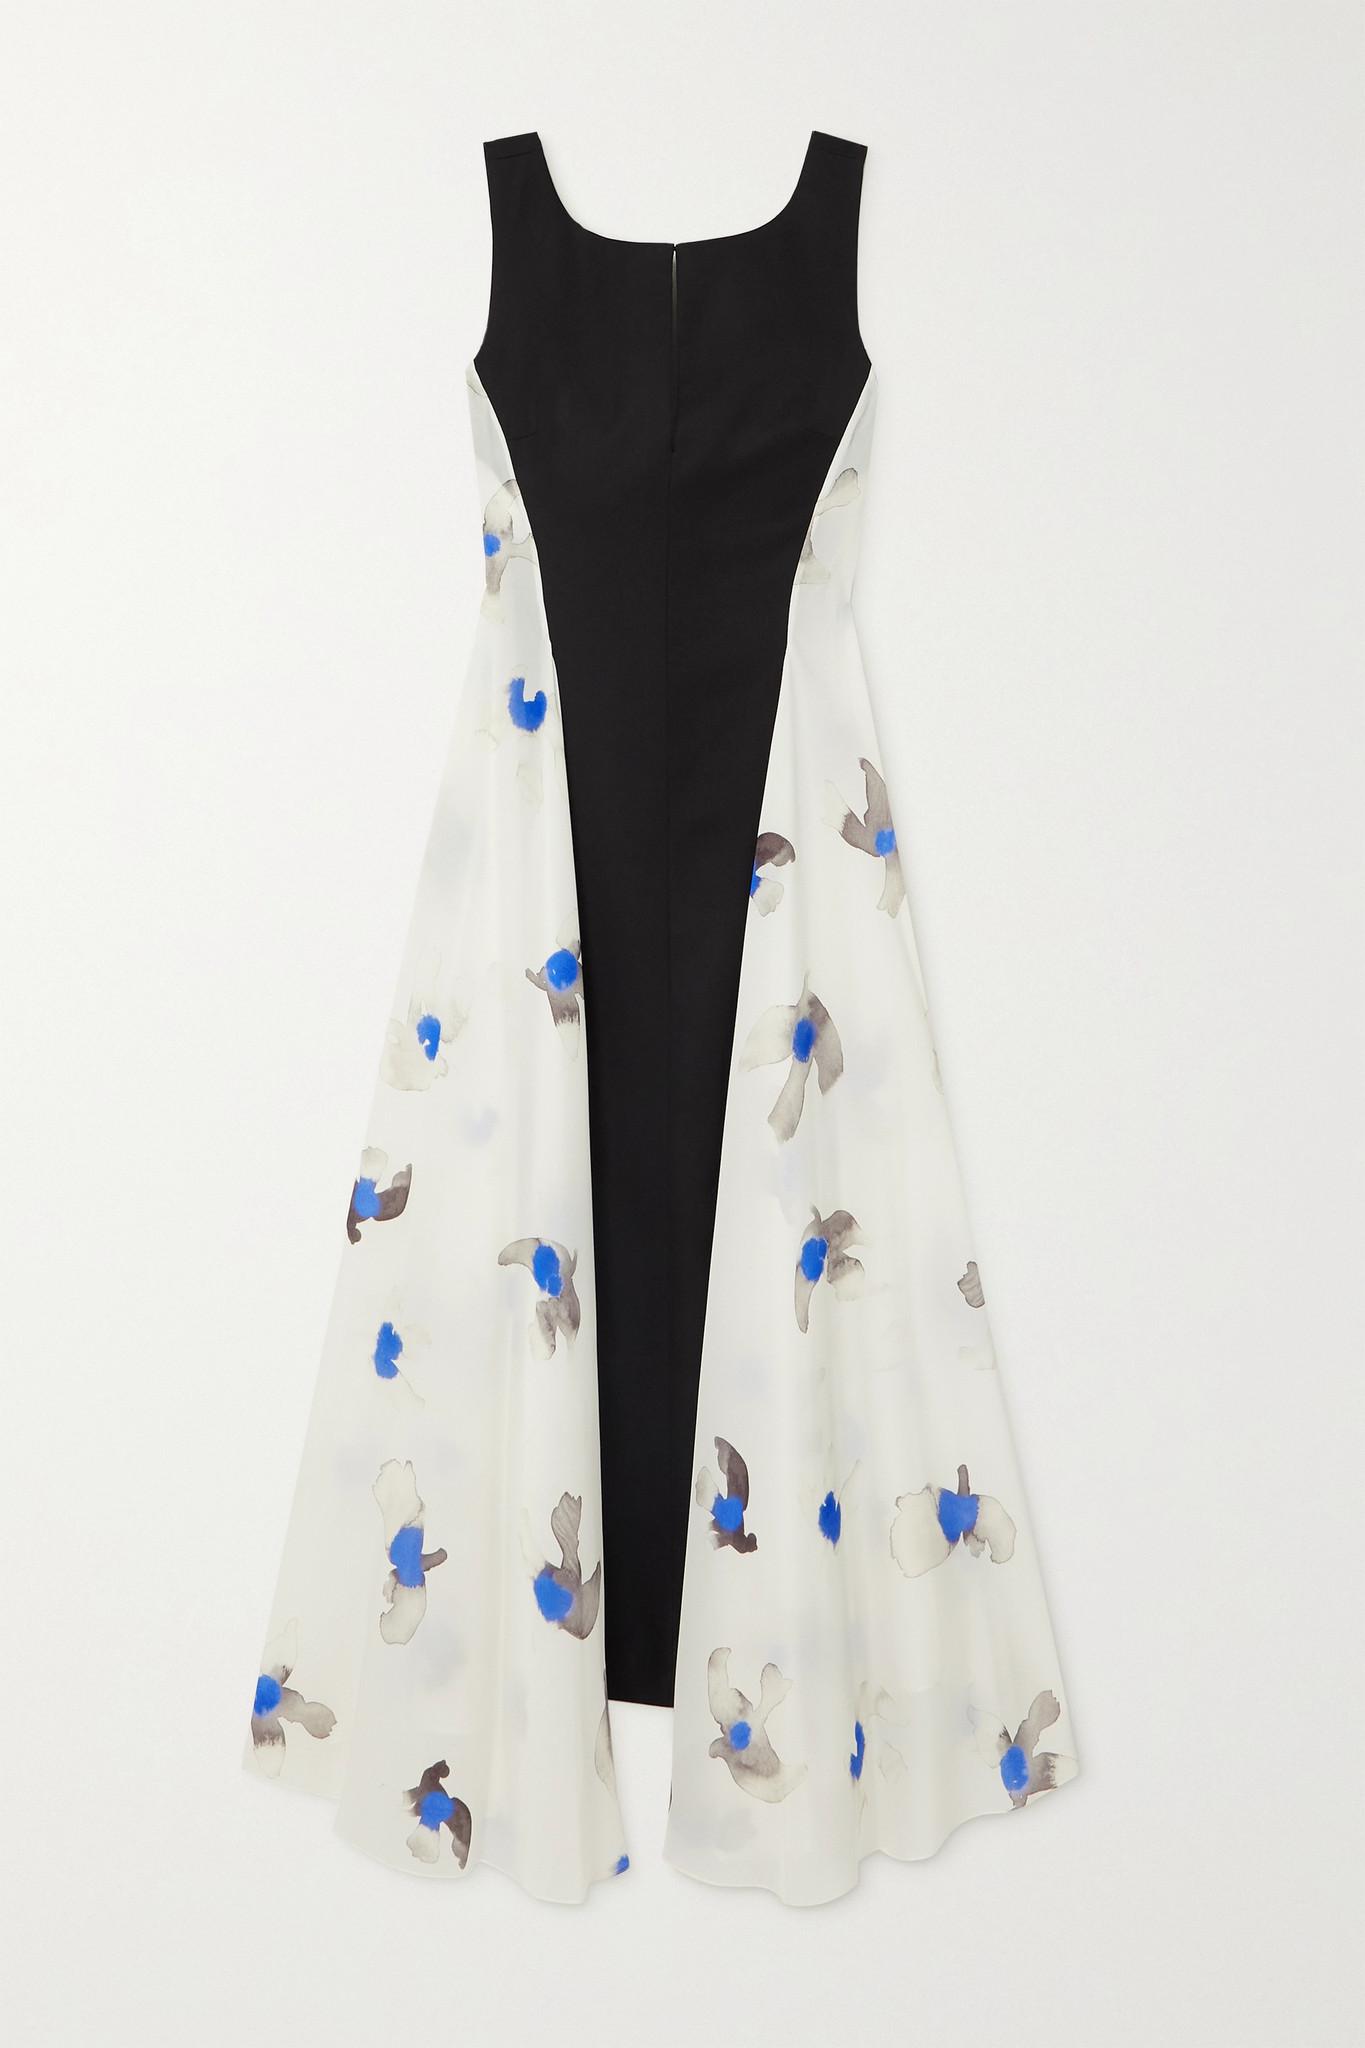 NINA RICCI - Paneled Printed Silk Crepe De Chine And Wool Dress - Ivory - FR34